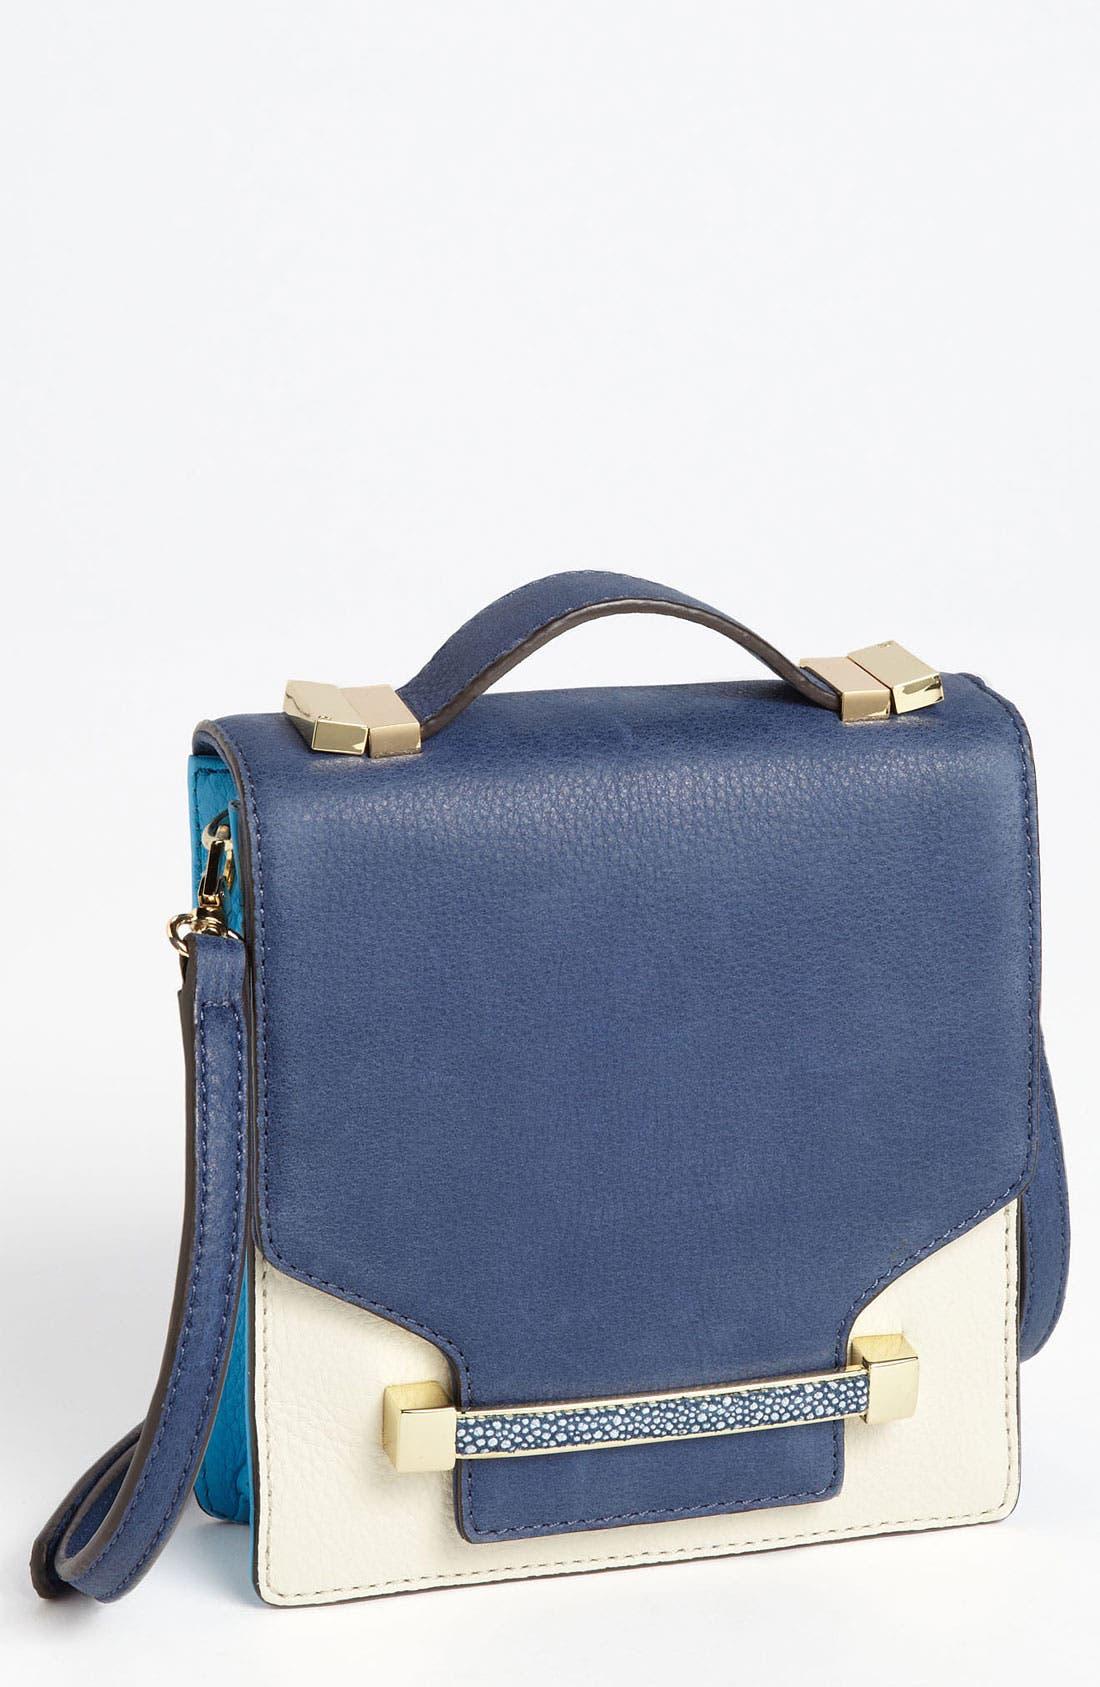 Main Image - Vince Camuto 'Julia' Crossbody Bag